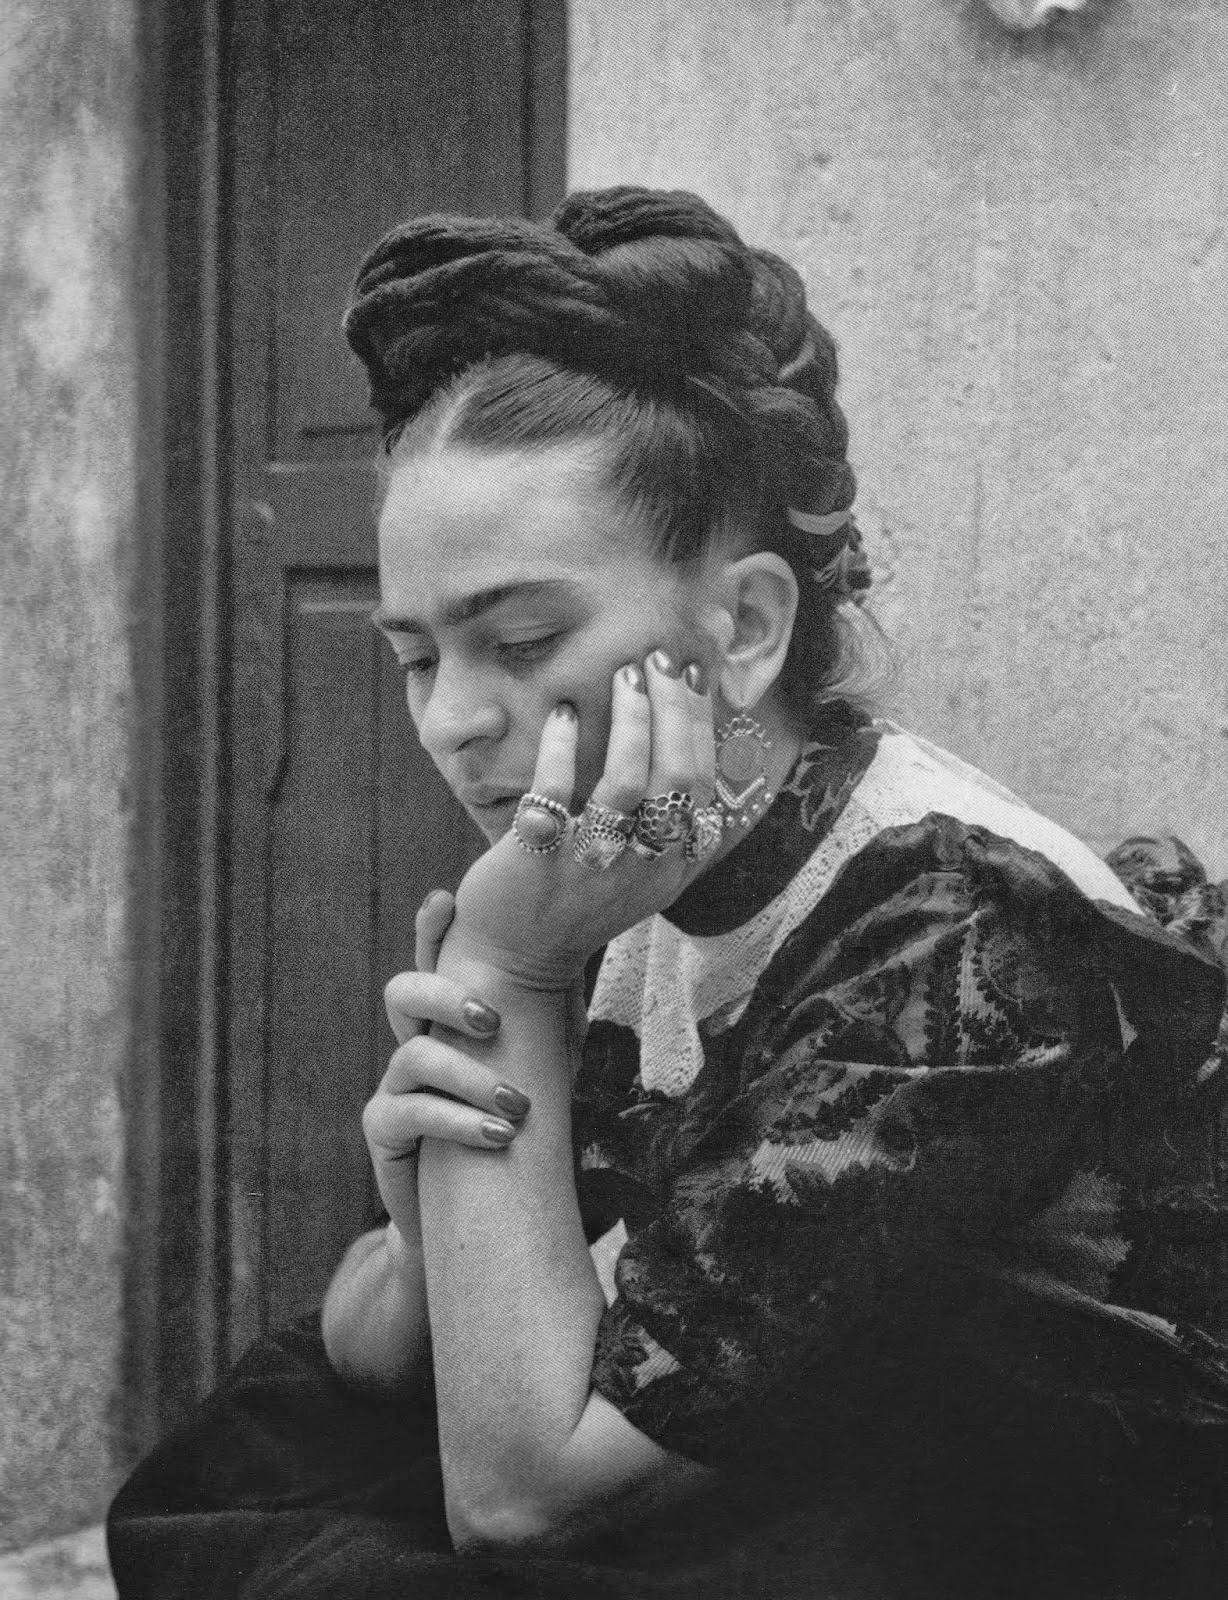 H Φρίντα Κάλο φωτογραφημένη από τη Λόλα Αλβάρεζ Μπράβο, 1944.